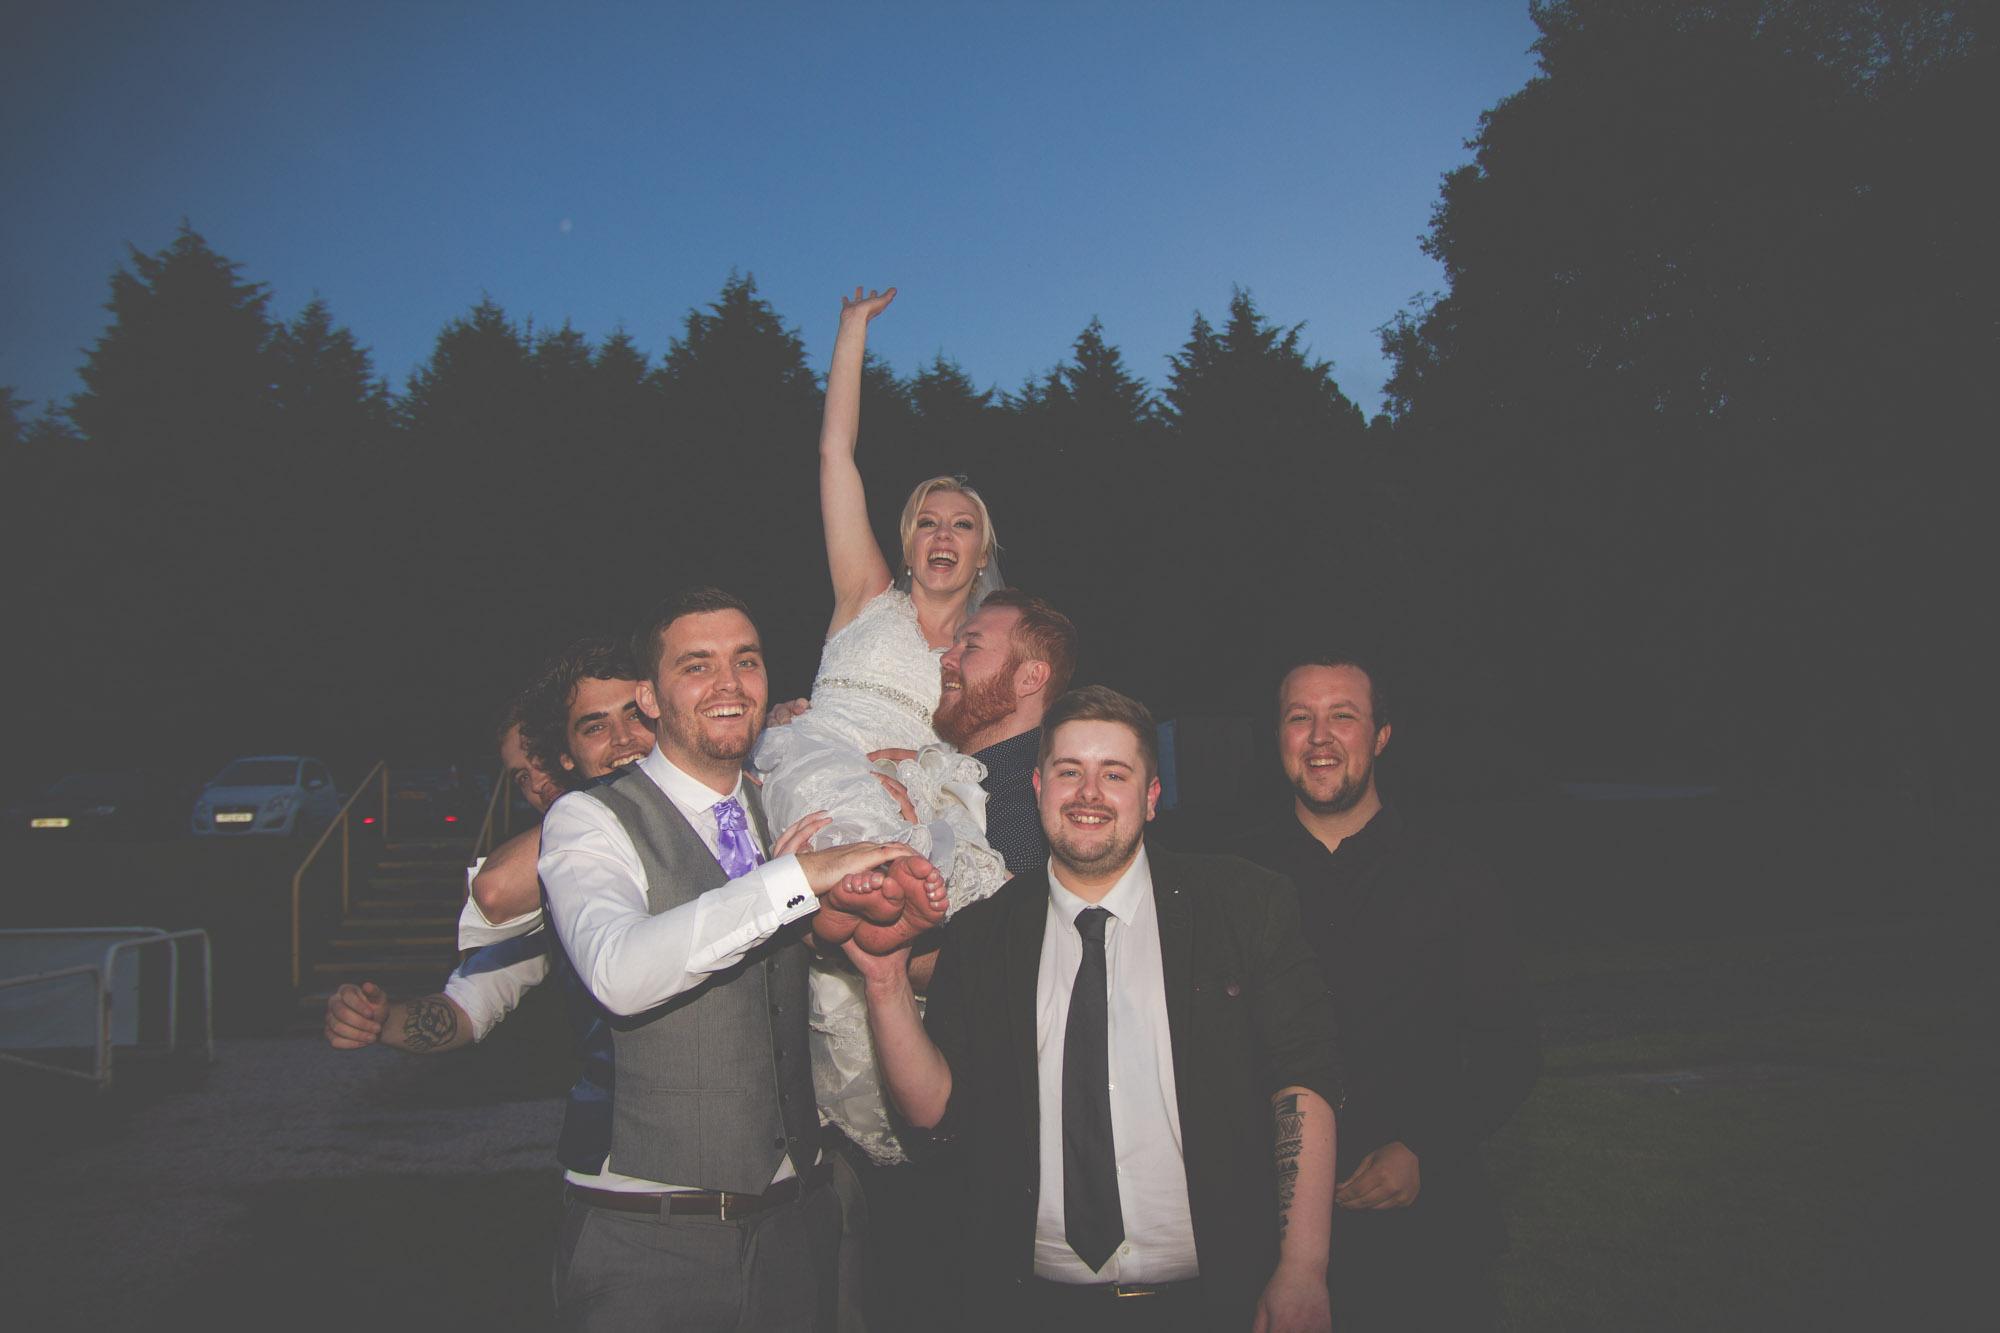 skipton-registry-office-wedding-photography-69.jpg